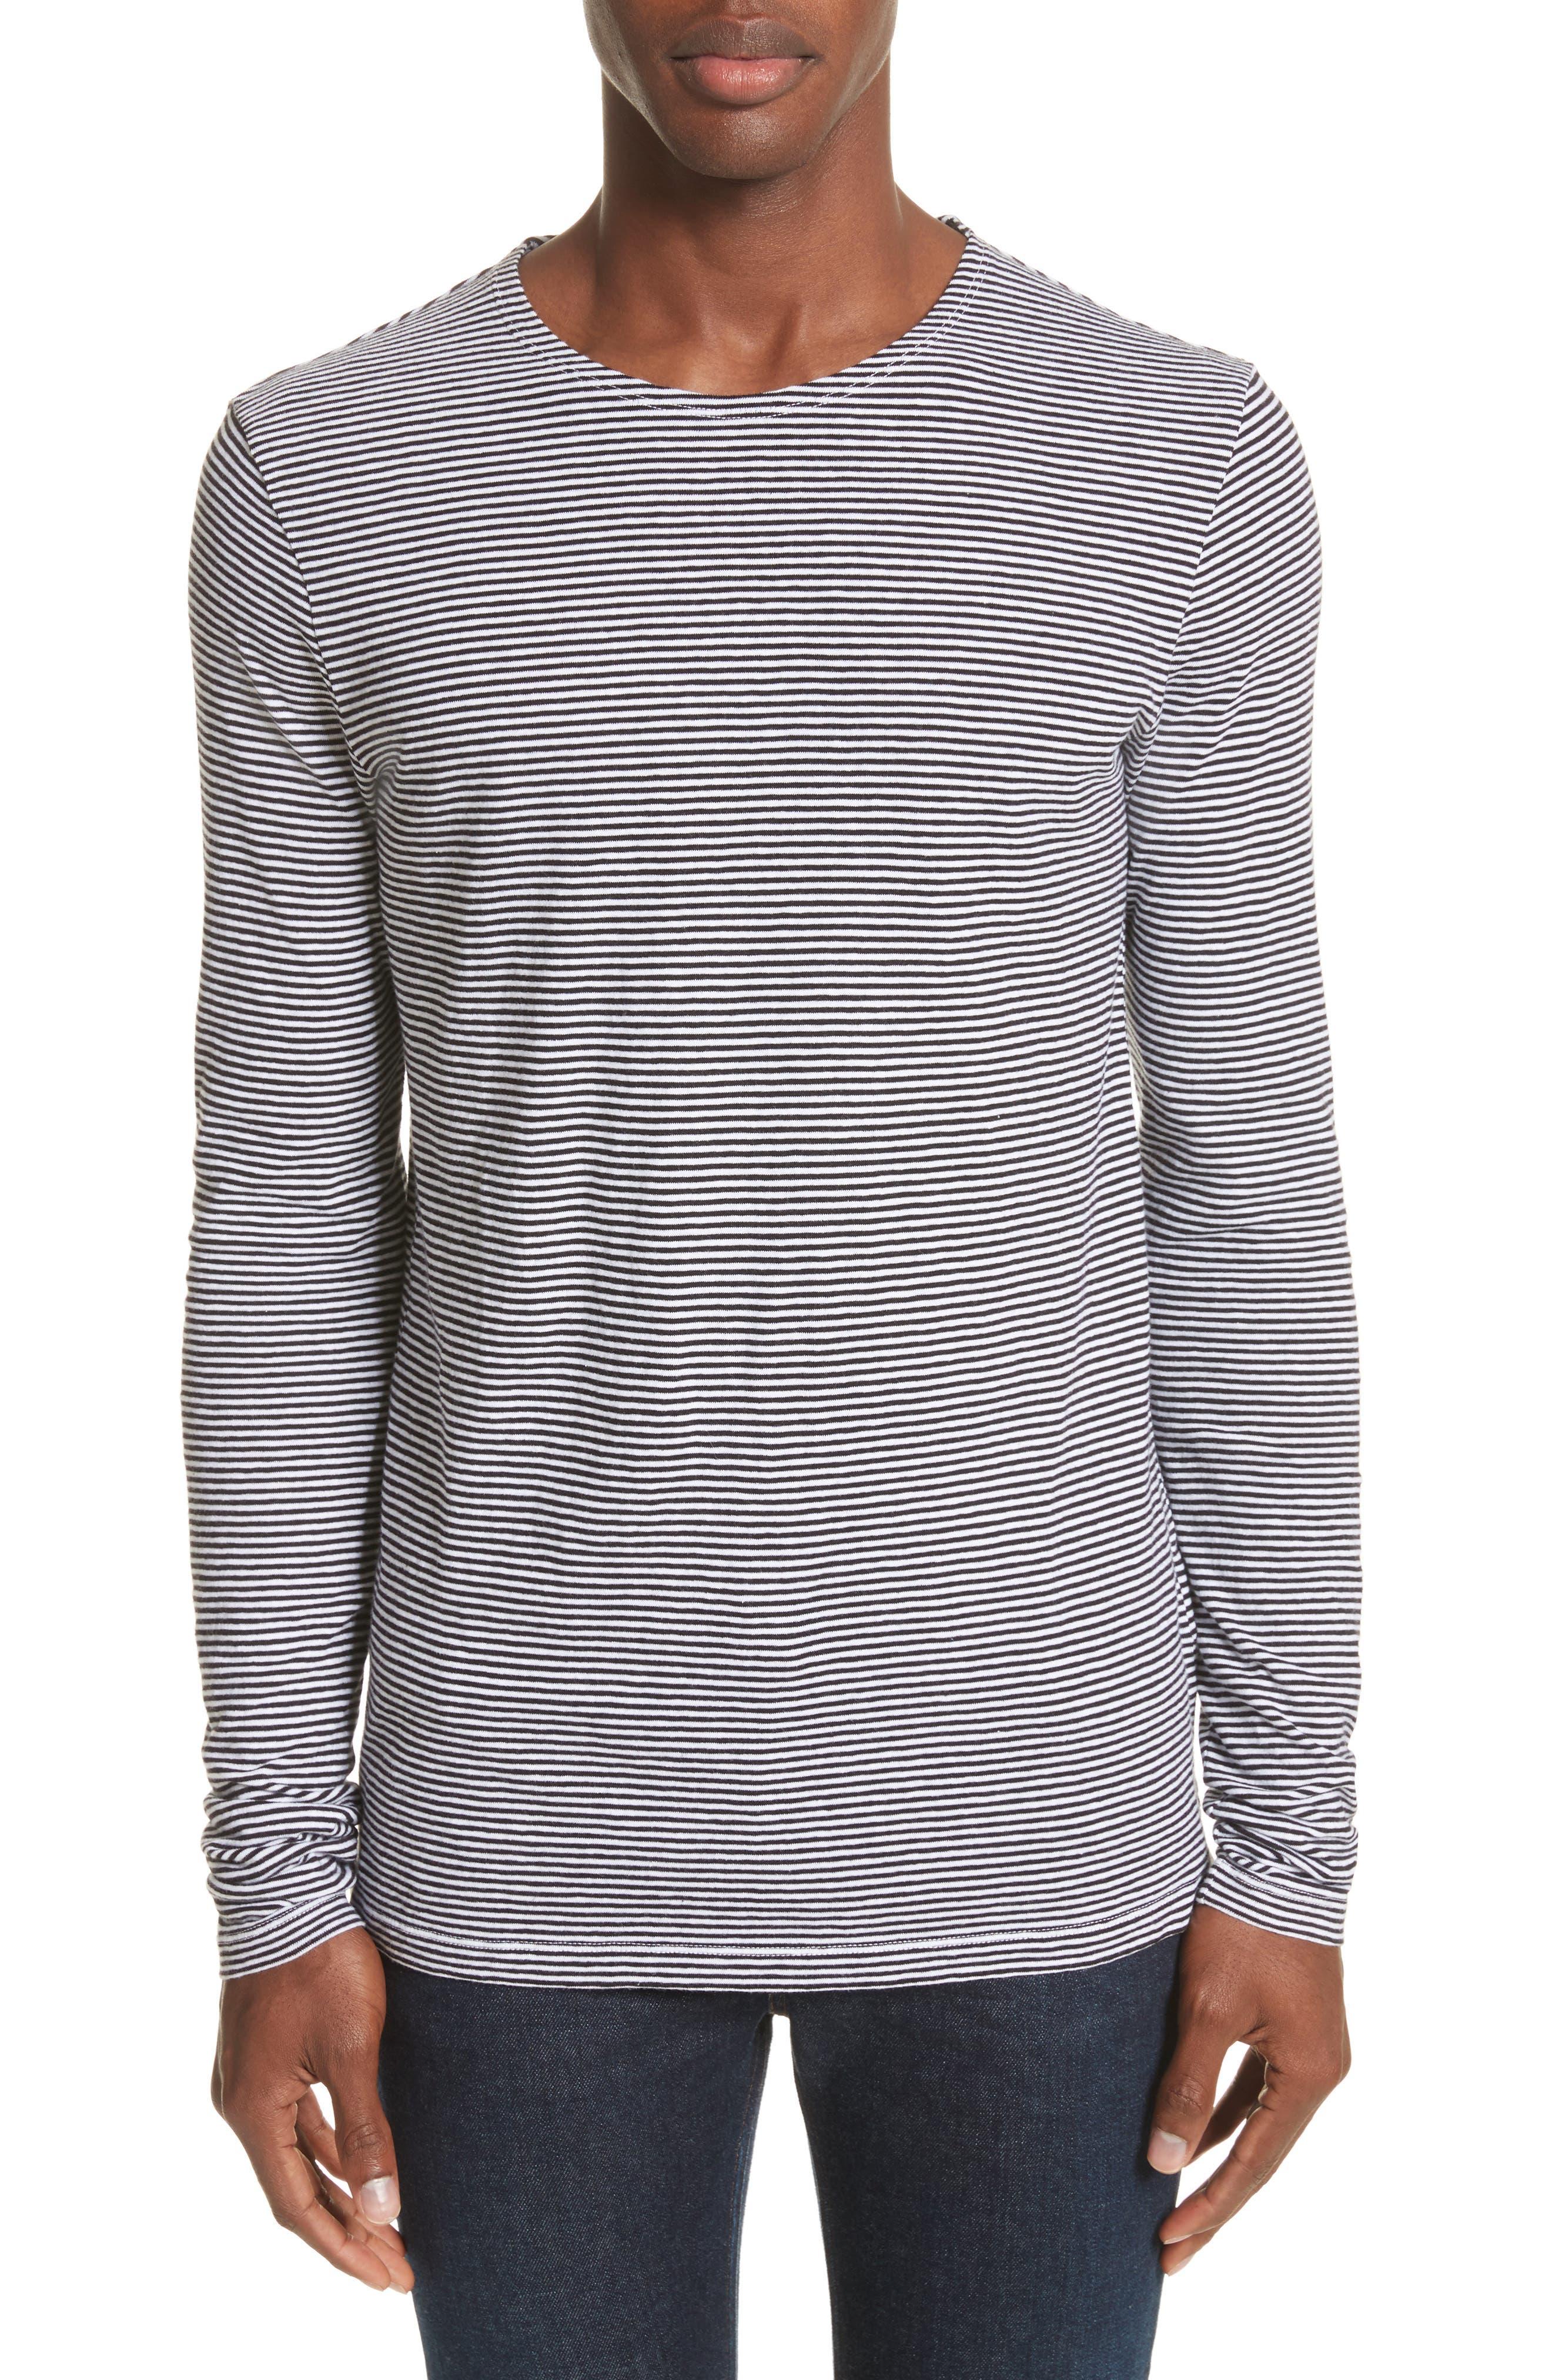 Tayford Stripe Long Sleeve T-Shirt,                             Main thumbnail 1, color,                             100